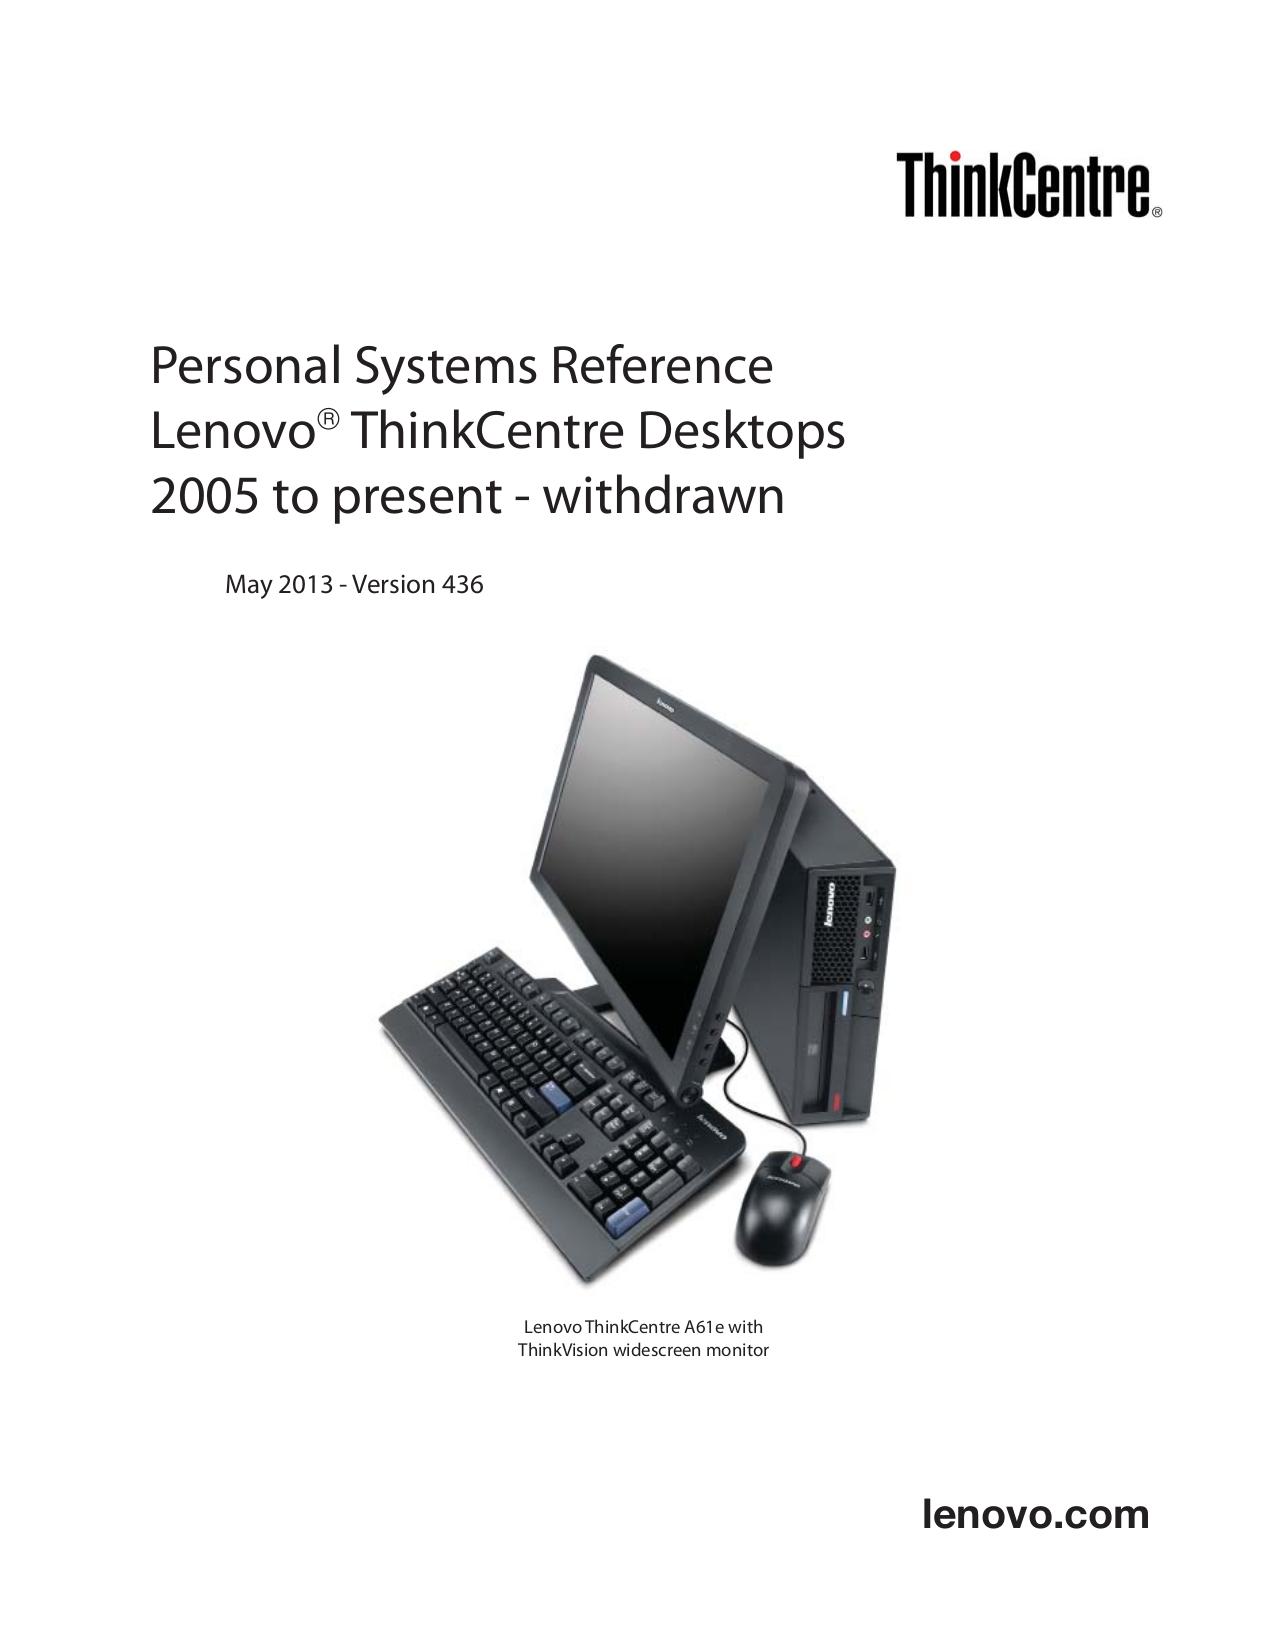 pdf for Lenovo Desktop ThinkCentre M52 8212 manual